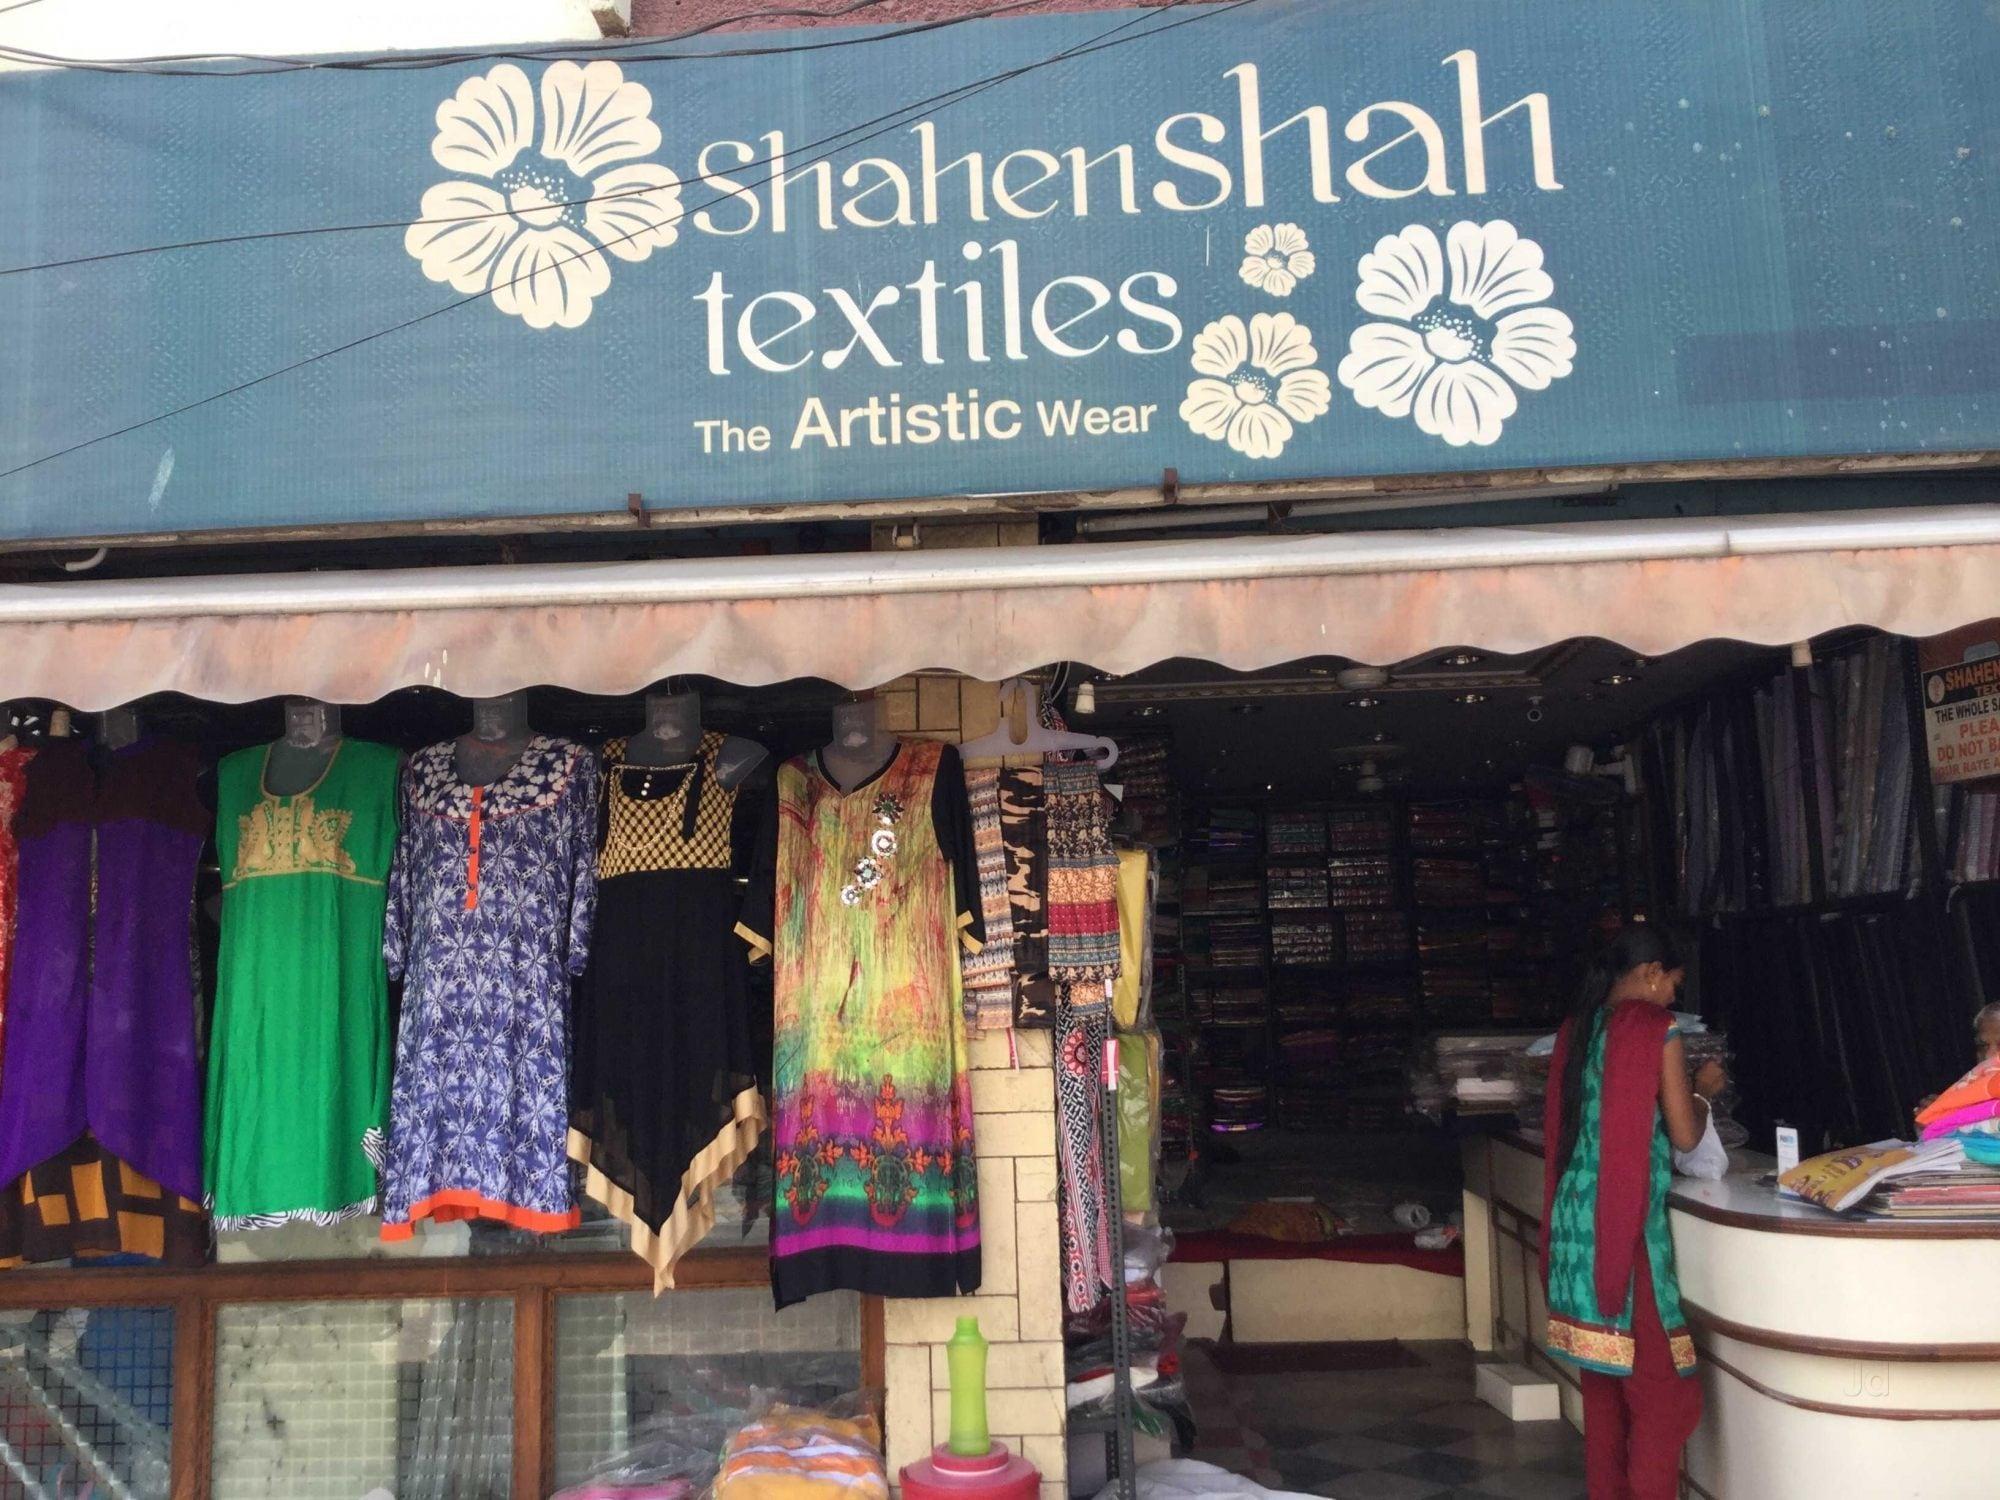 Top Daisy Dee Bra Retailers in Mehdipatnam - Best Daisy Dee Bra Retailers  Hyderabad - Justdial 81dcb9dbb